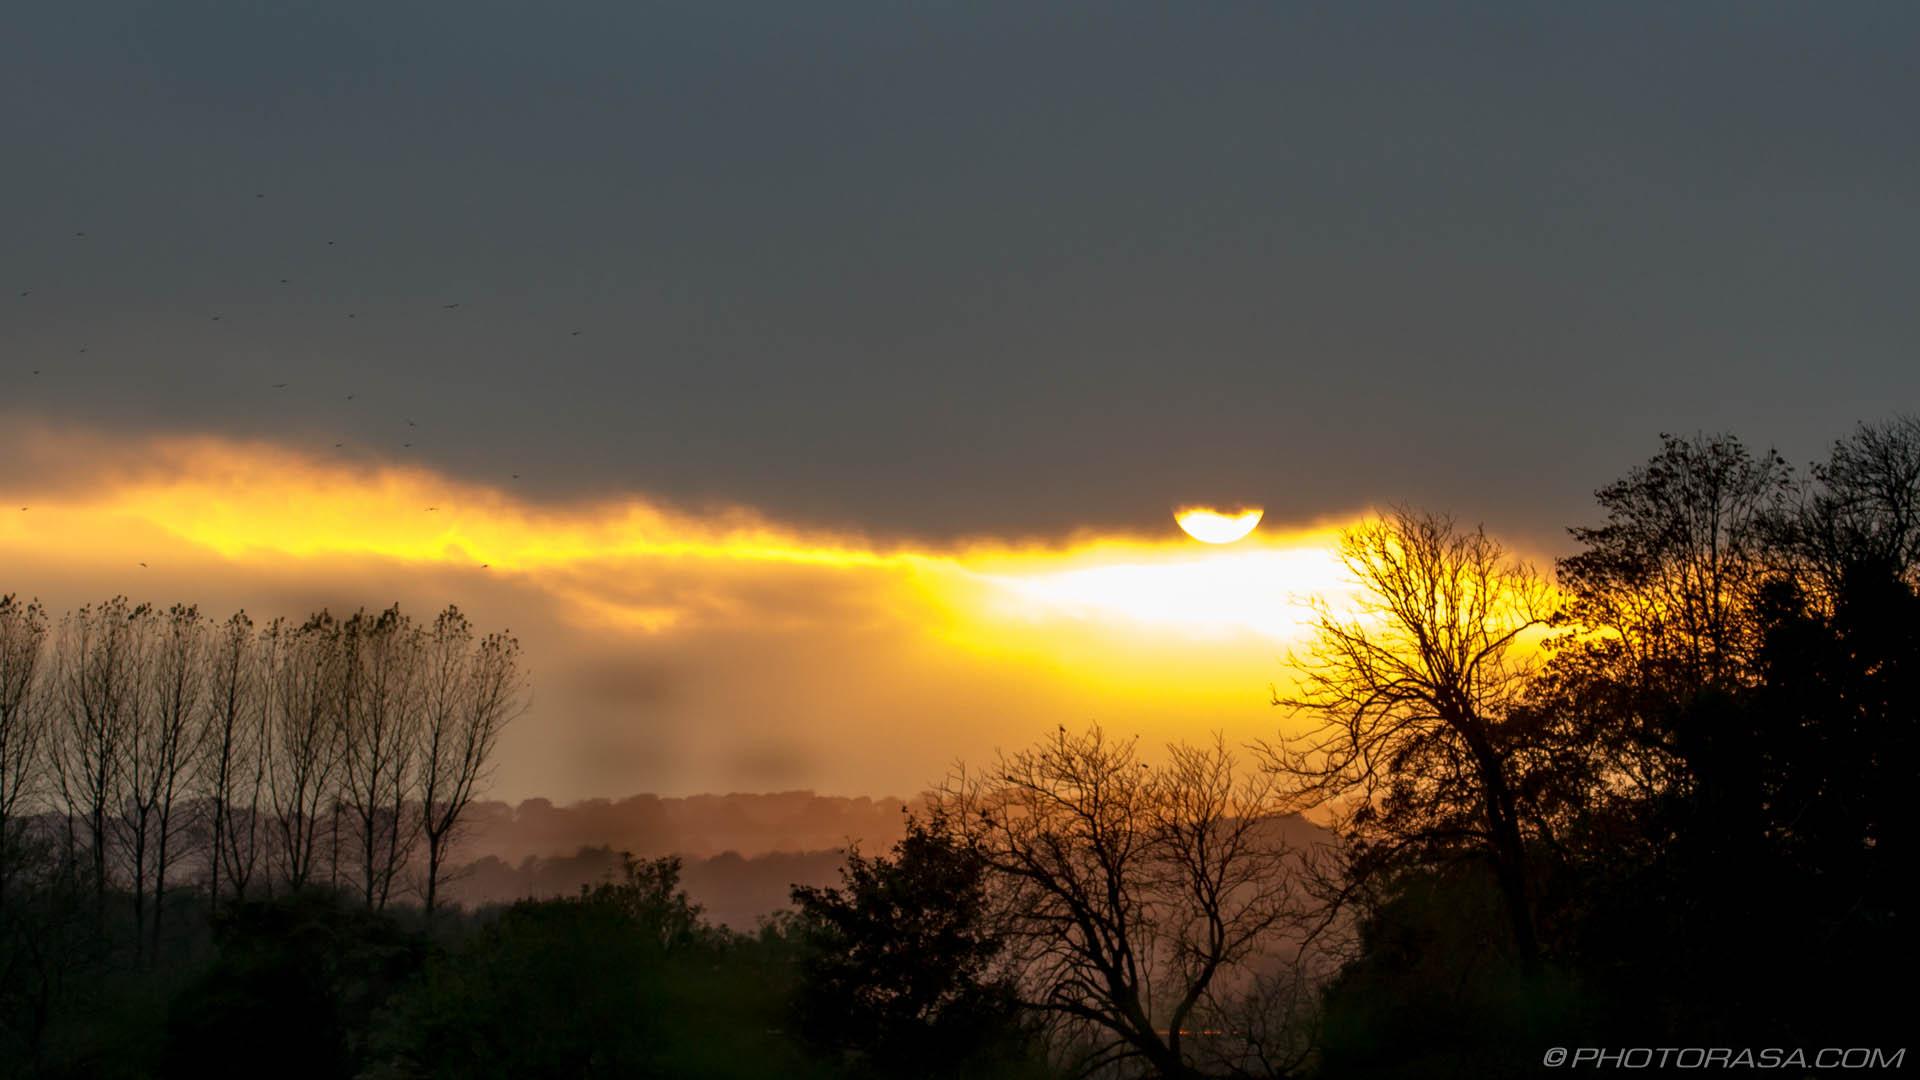 https://photorasa.com/sun-shining-through-the-clouds/sun-shining-through-clouds-and-tree-shadows/